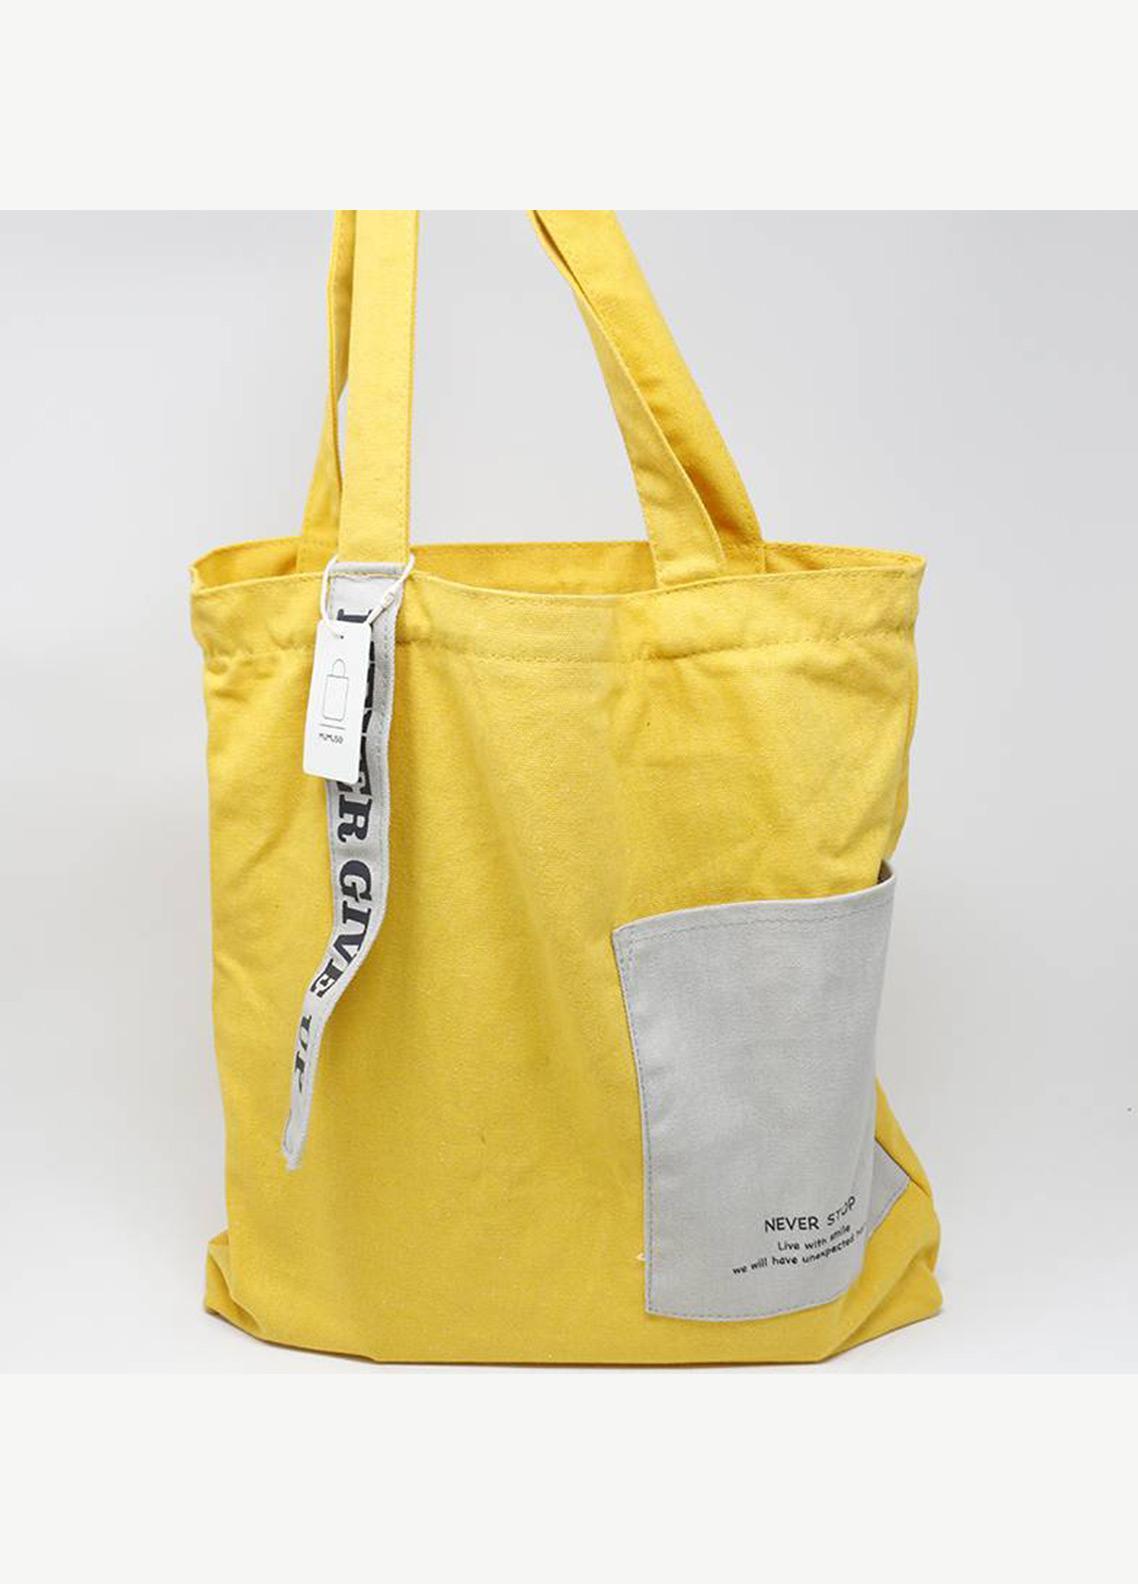 Mumuso CANVAS SHOULDER BAG-YELLOW